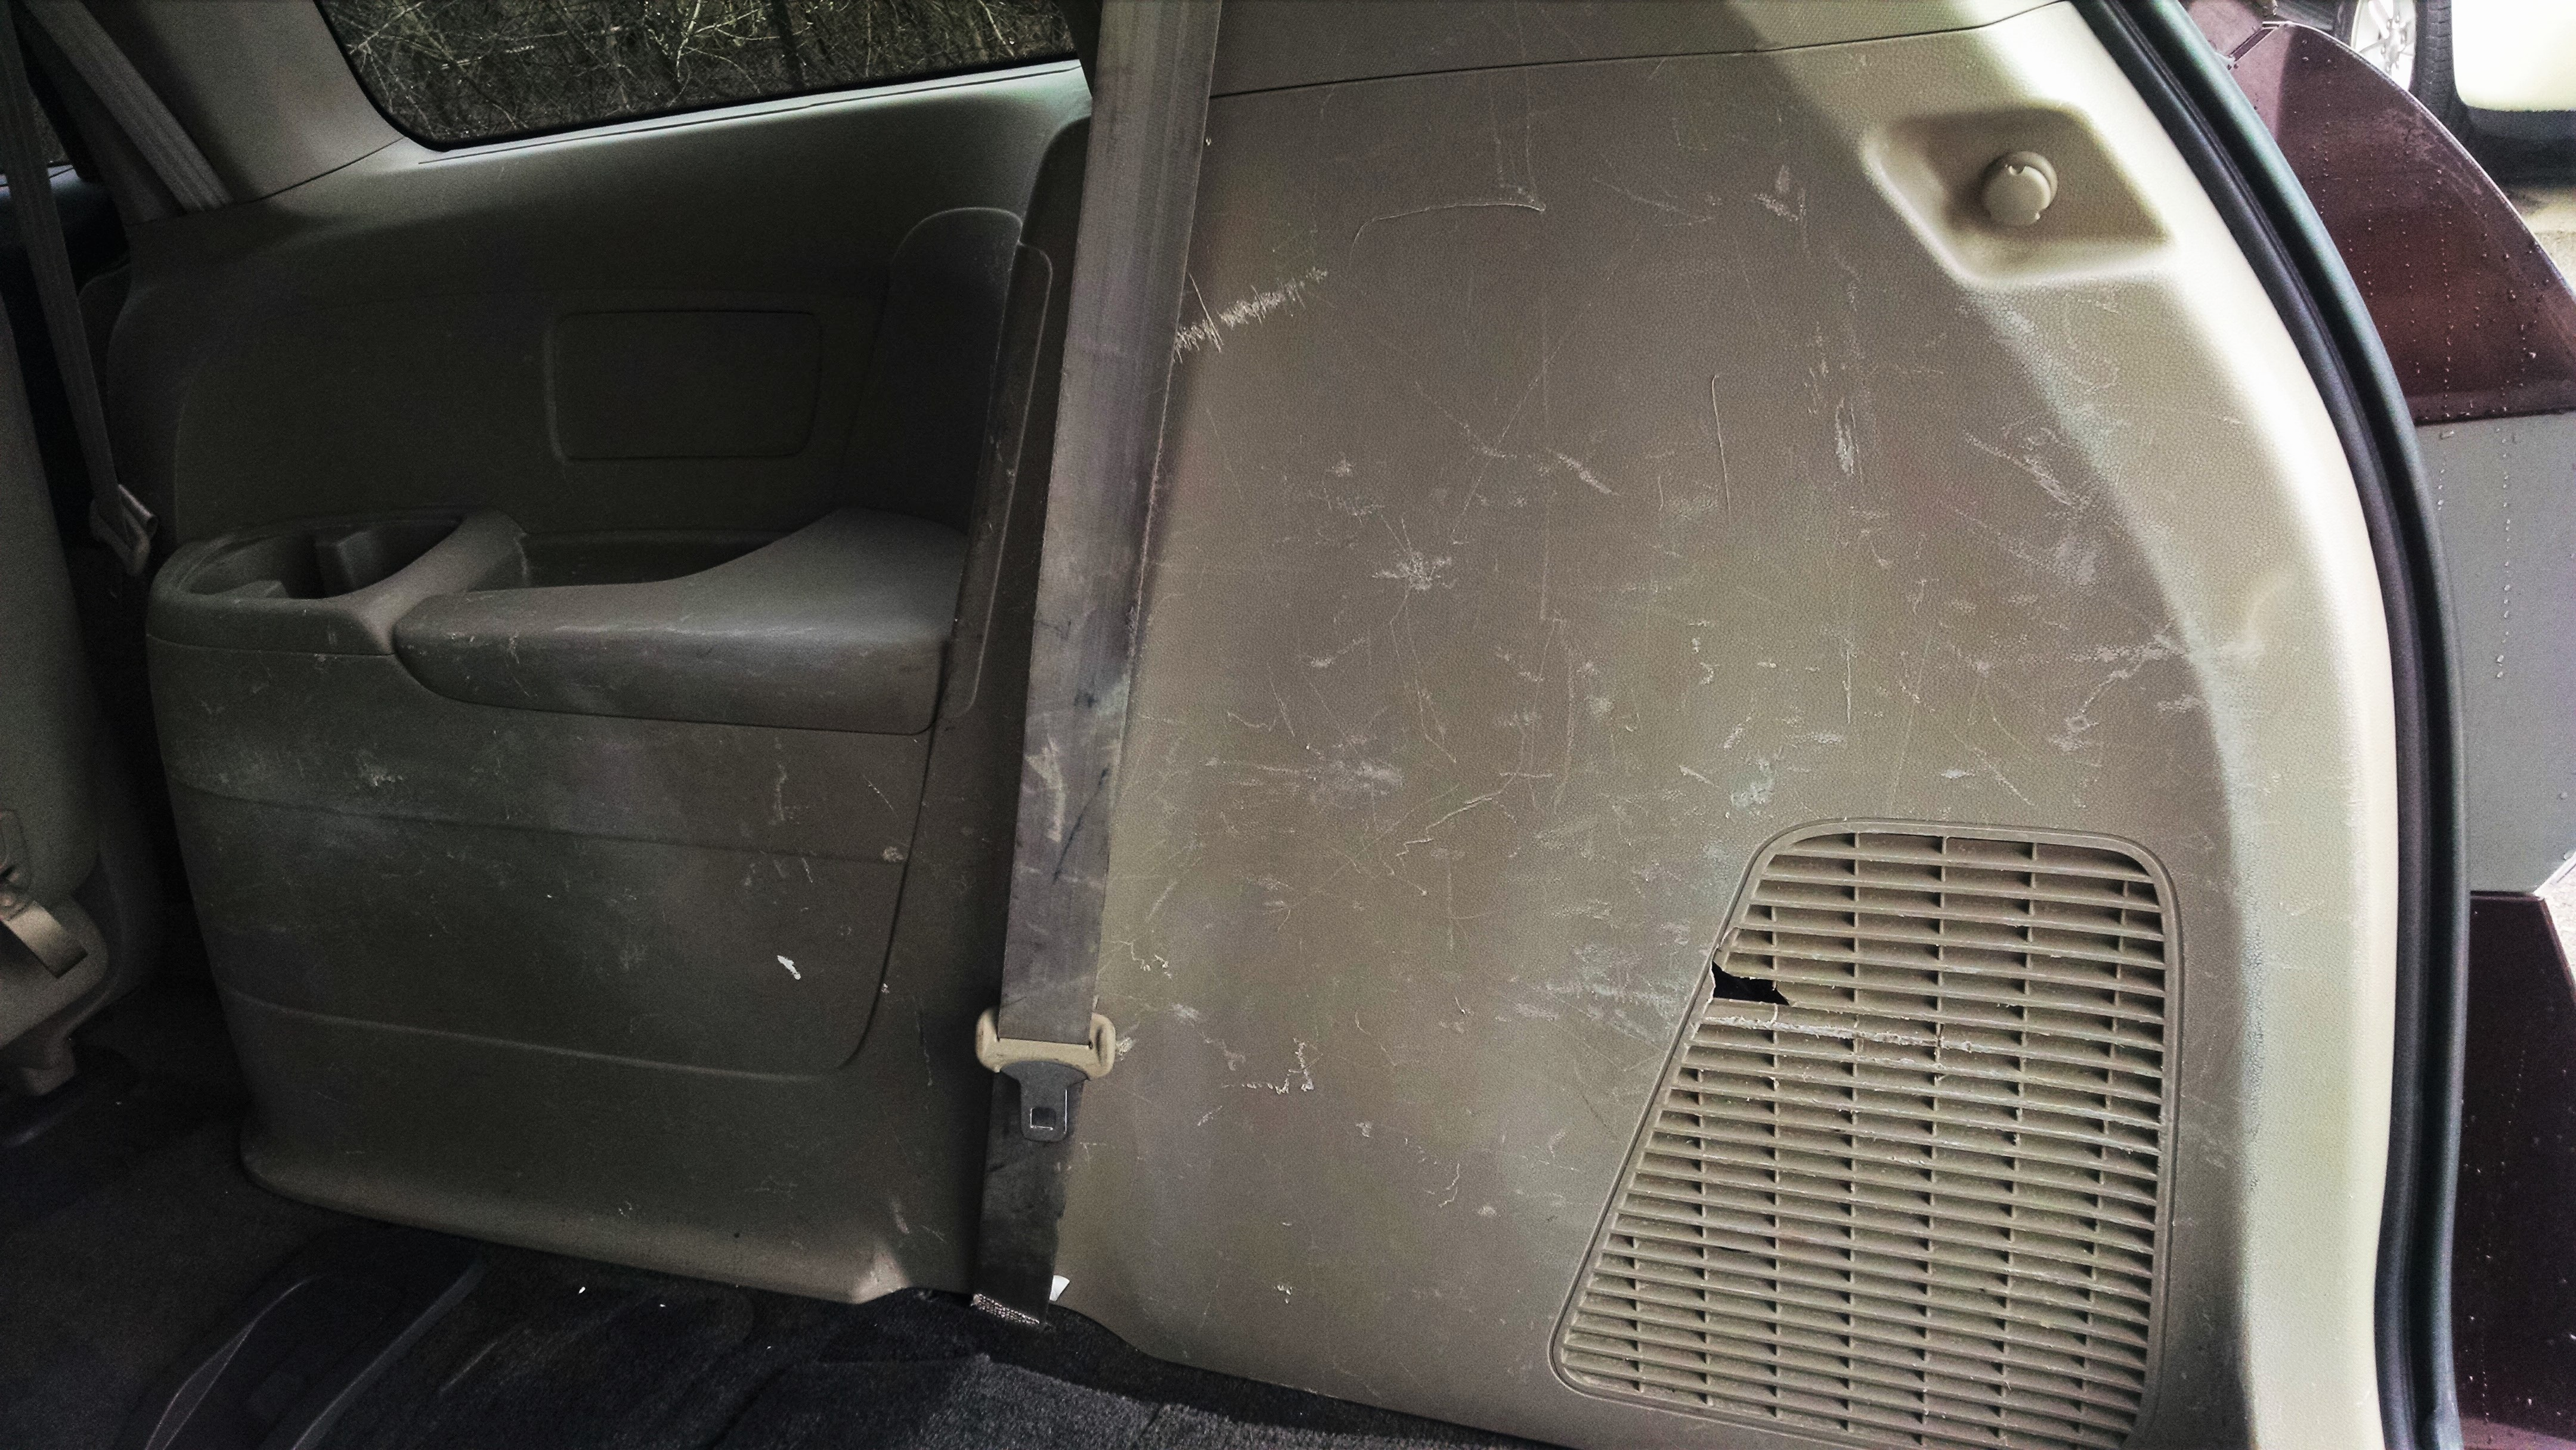 Why I drive a dented car